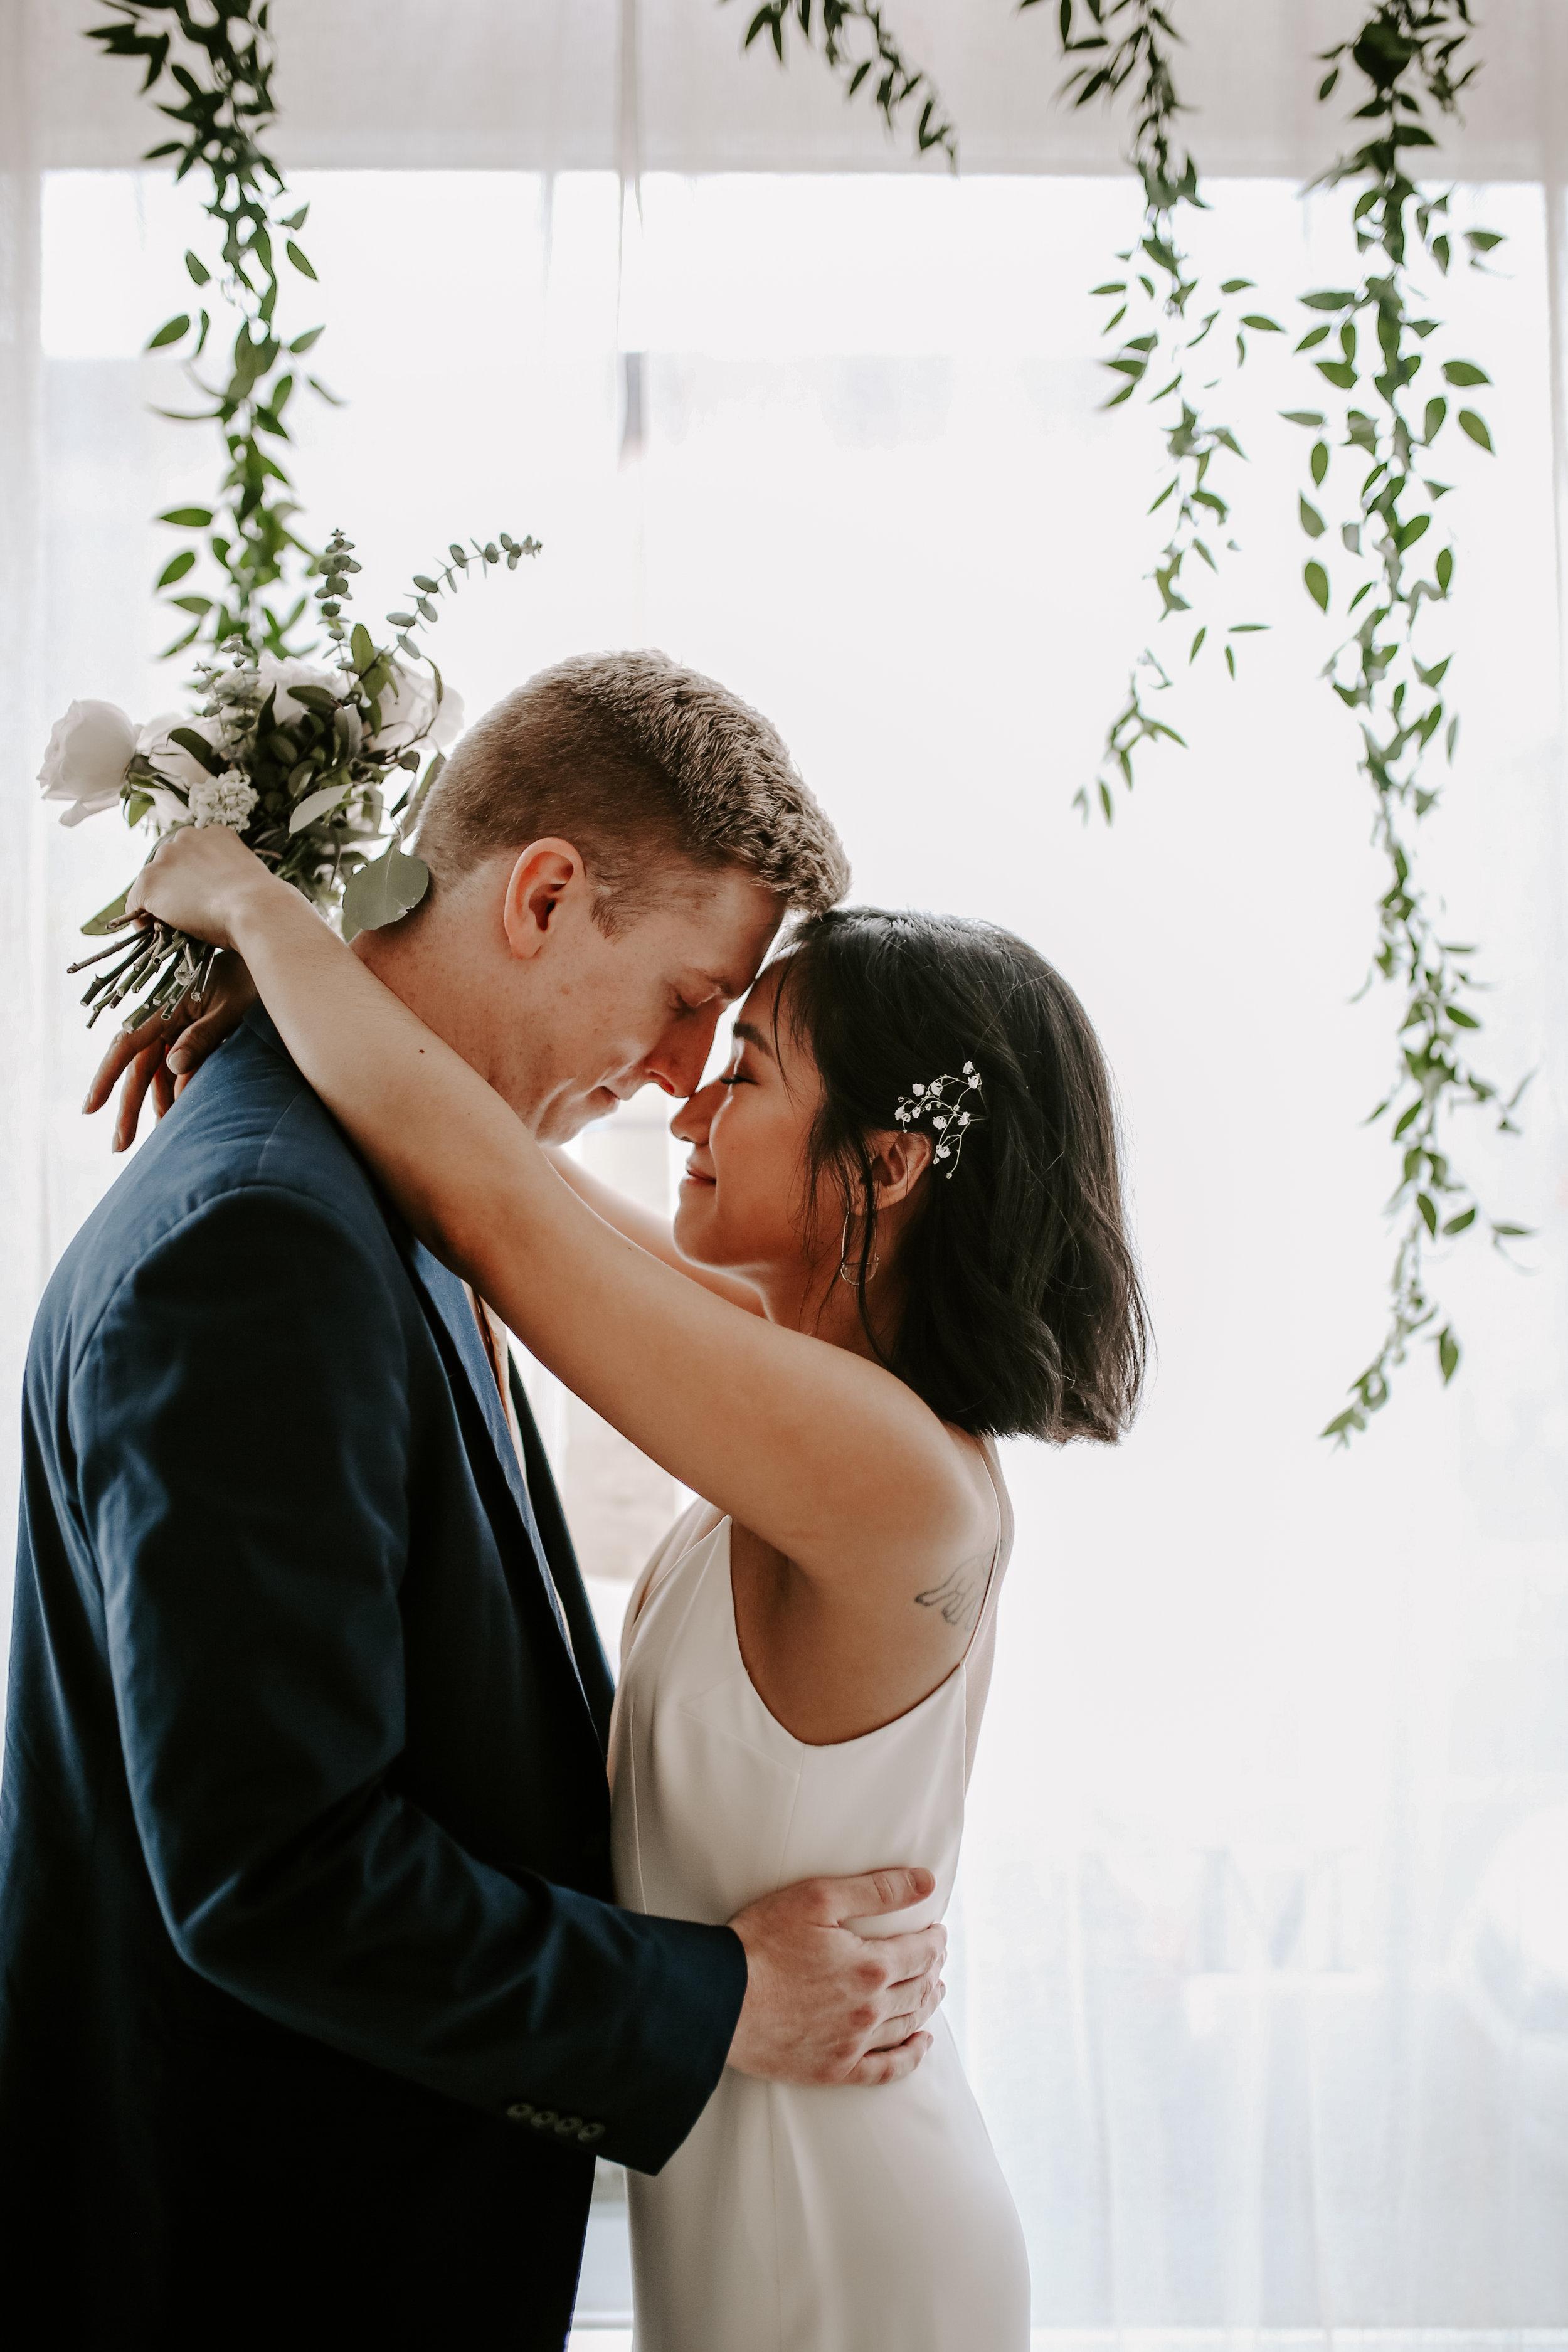 TheNichols_Married_2019-129.jpg